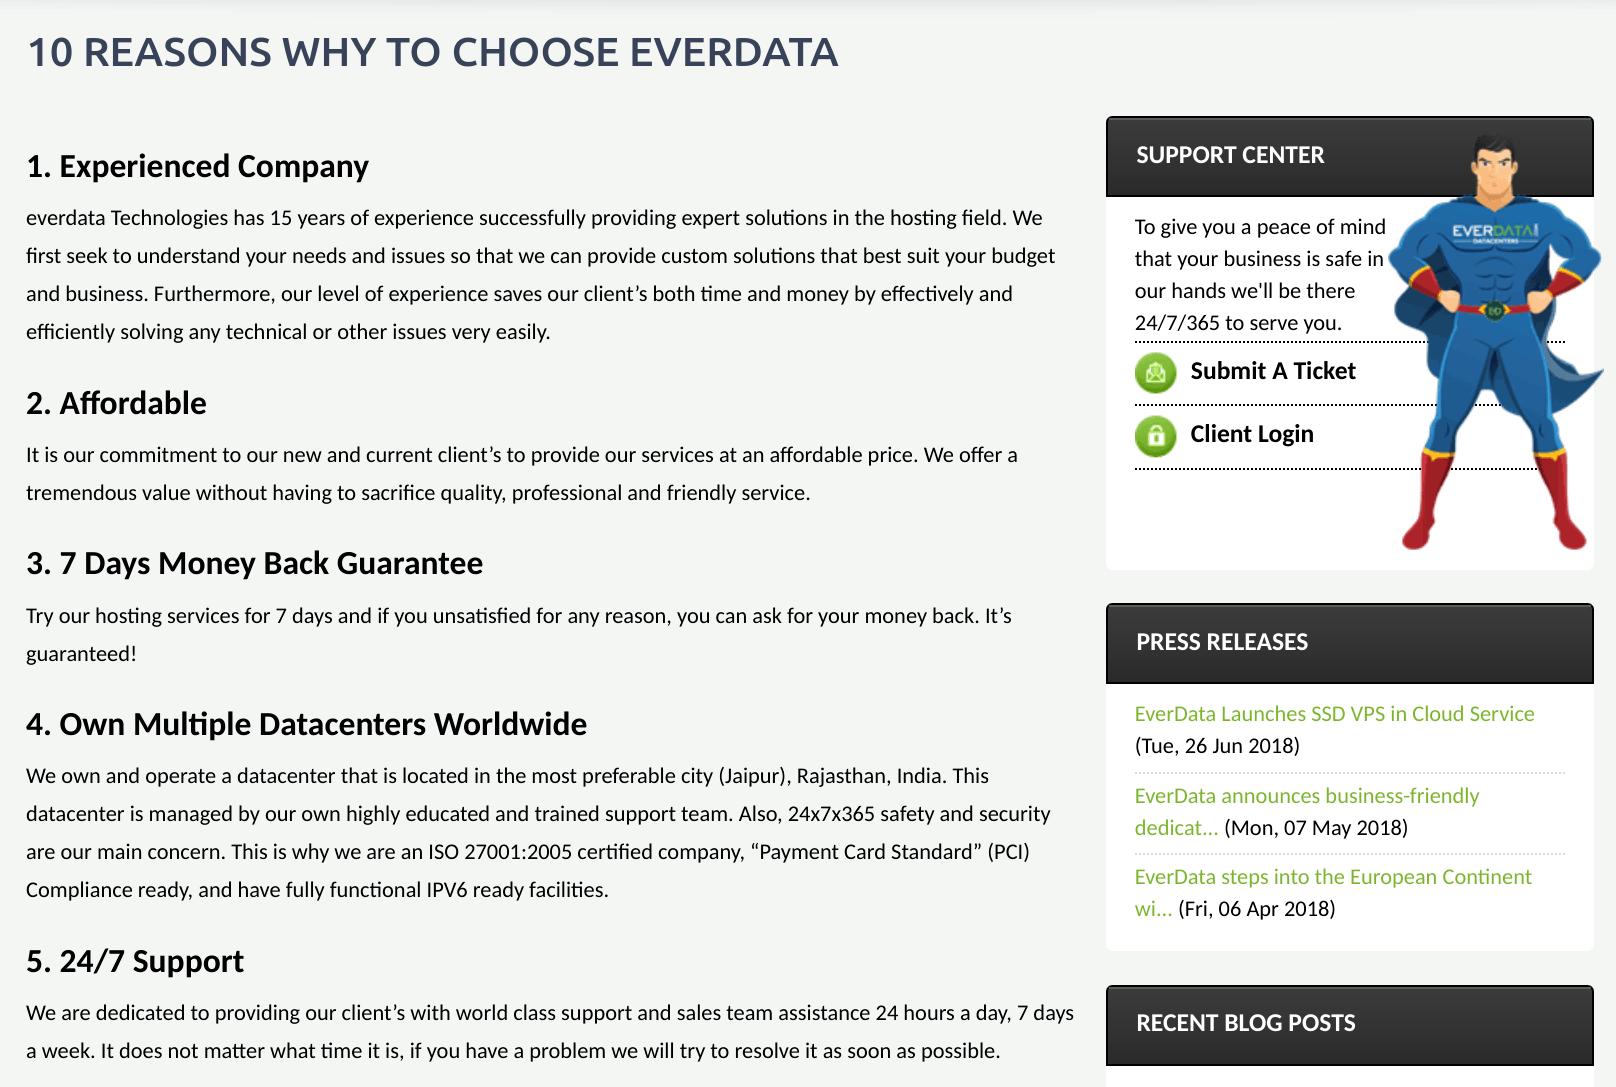 EverData